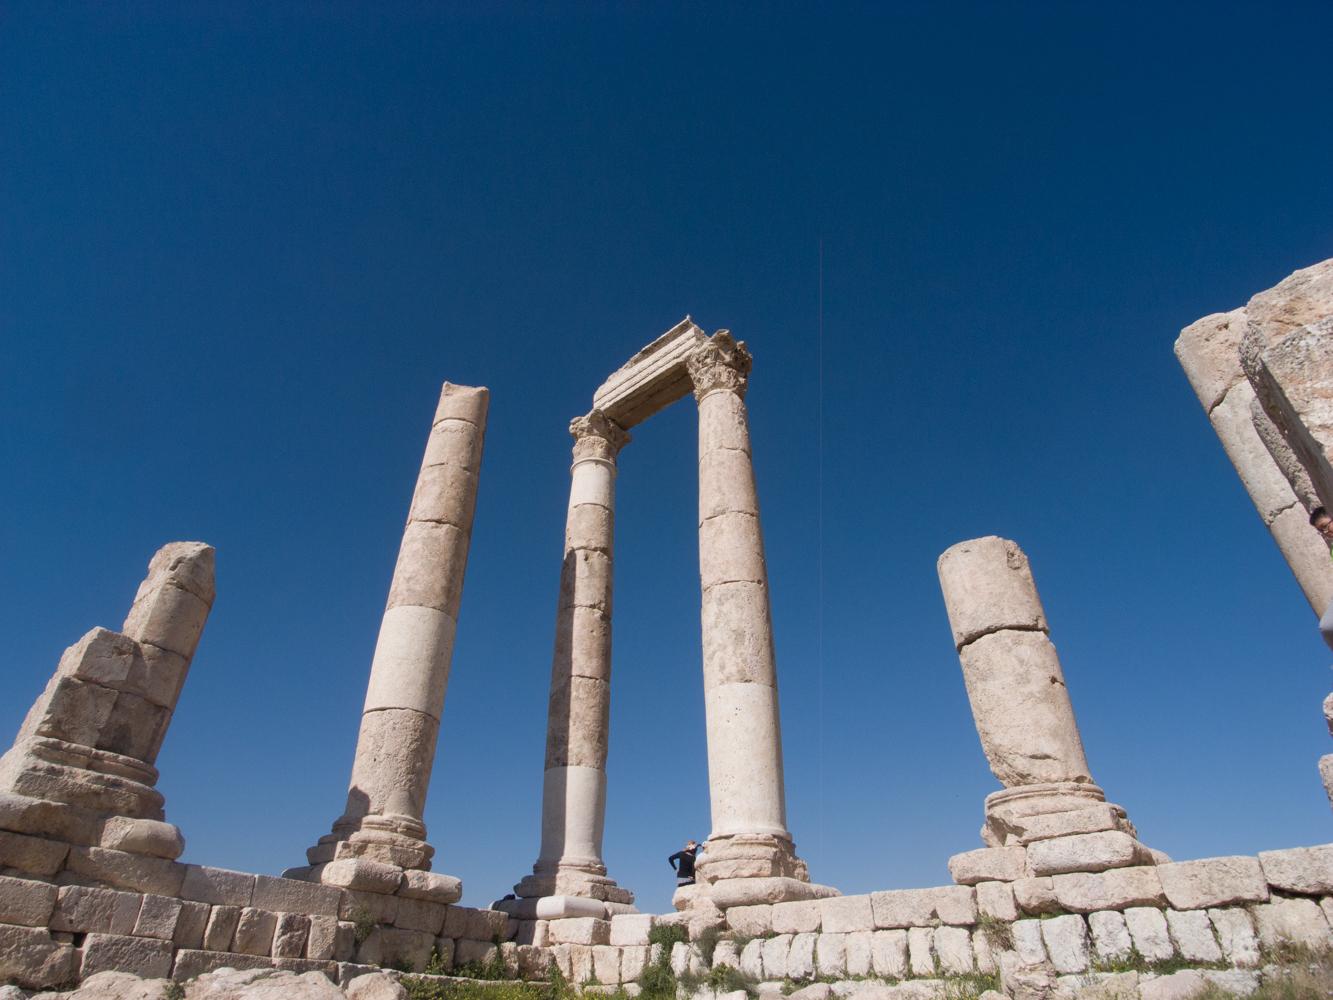 Jordanien_Aqaba_Rotes_Meer_Amman_Fotos-13